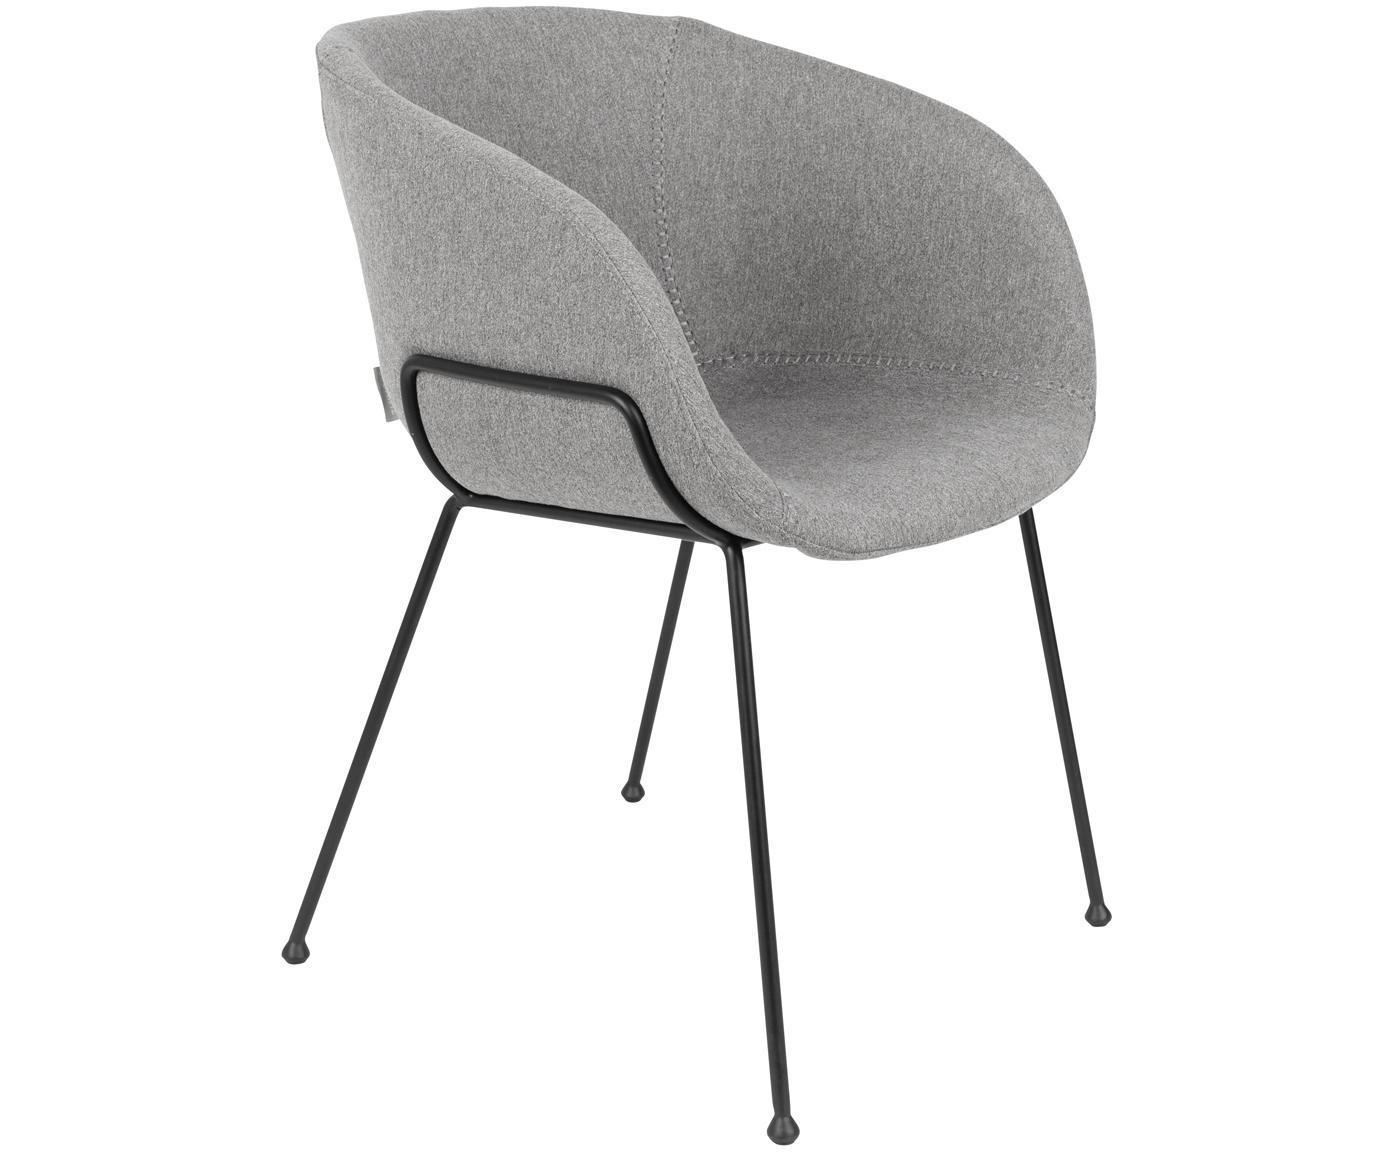 Armlehnstühle Feston, 2 Stück, Bezug: 50 % Polyurethan, 50% Pol, Sitzschale: Spanplatte, Grau, B 57 x T 55 cm